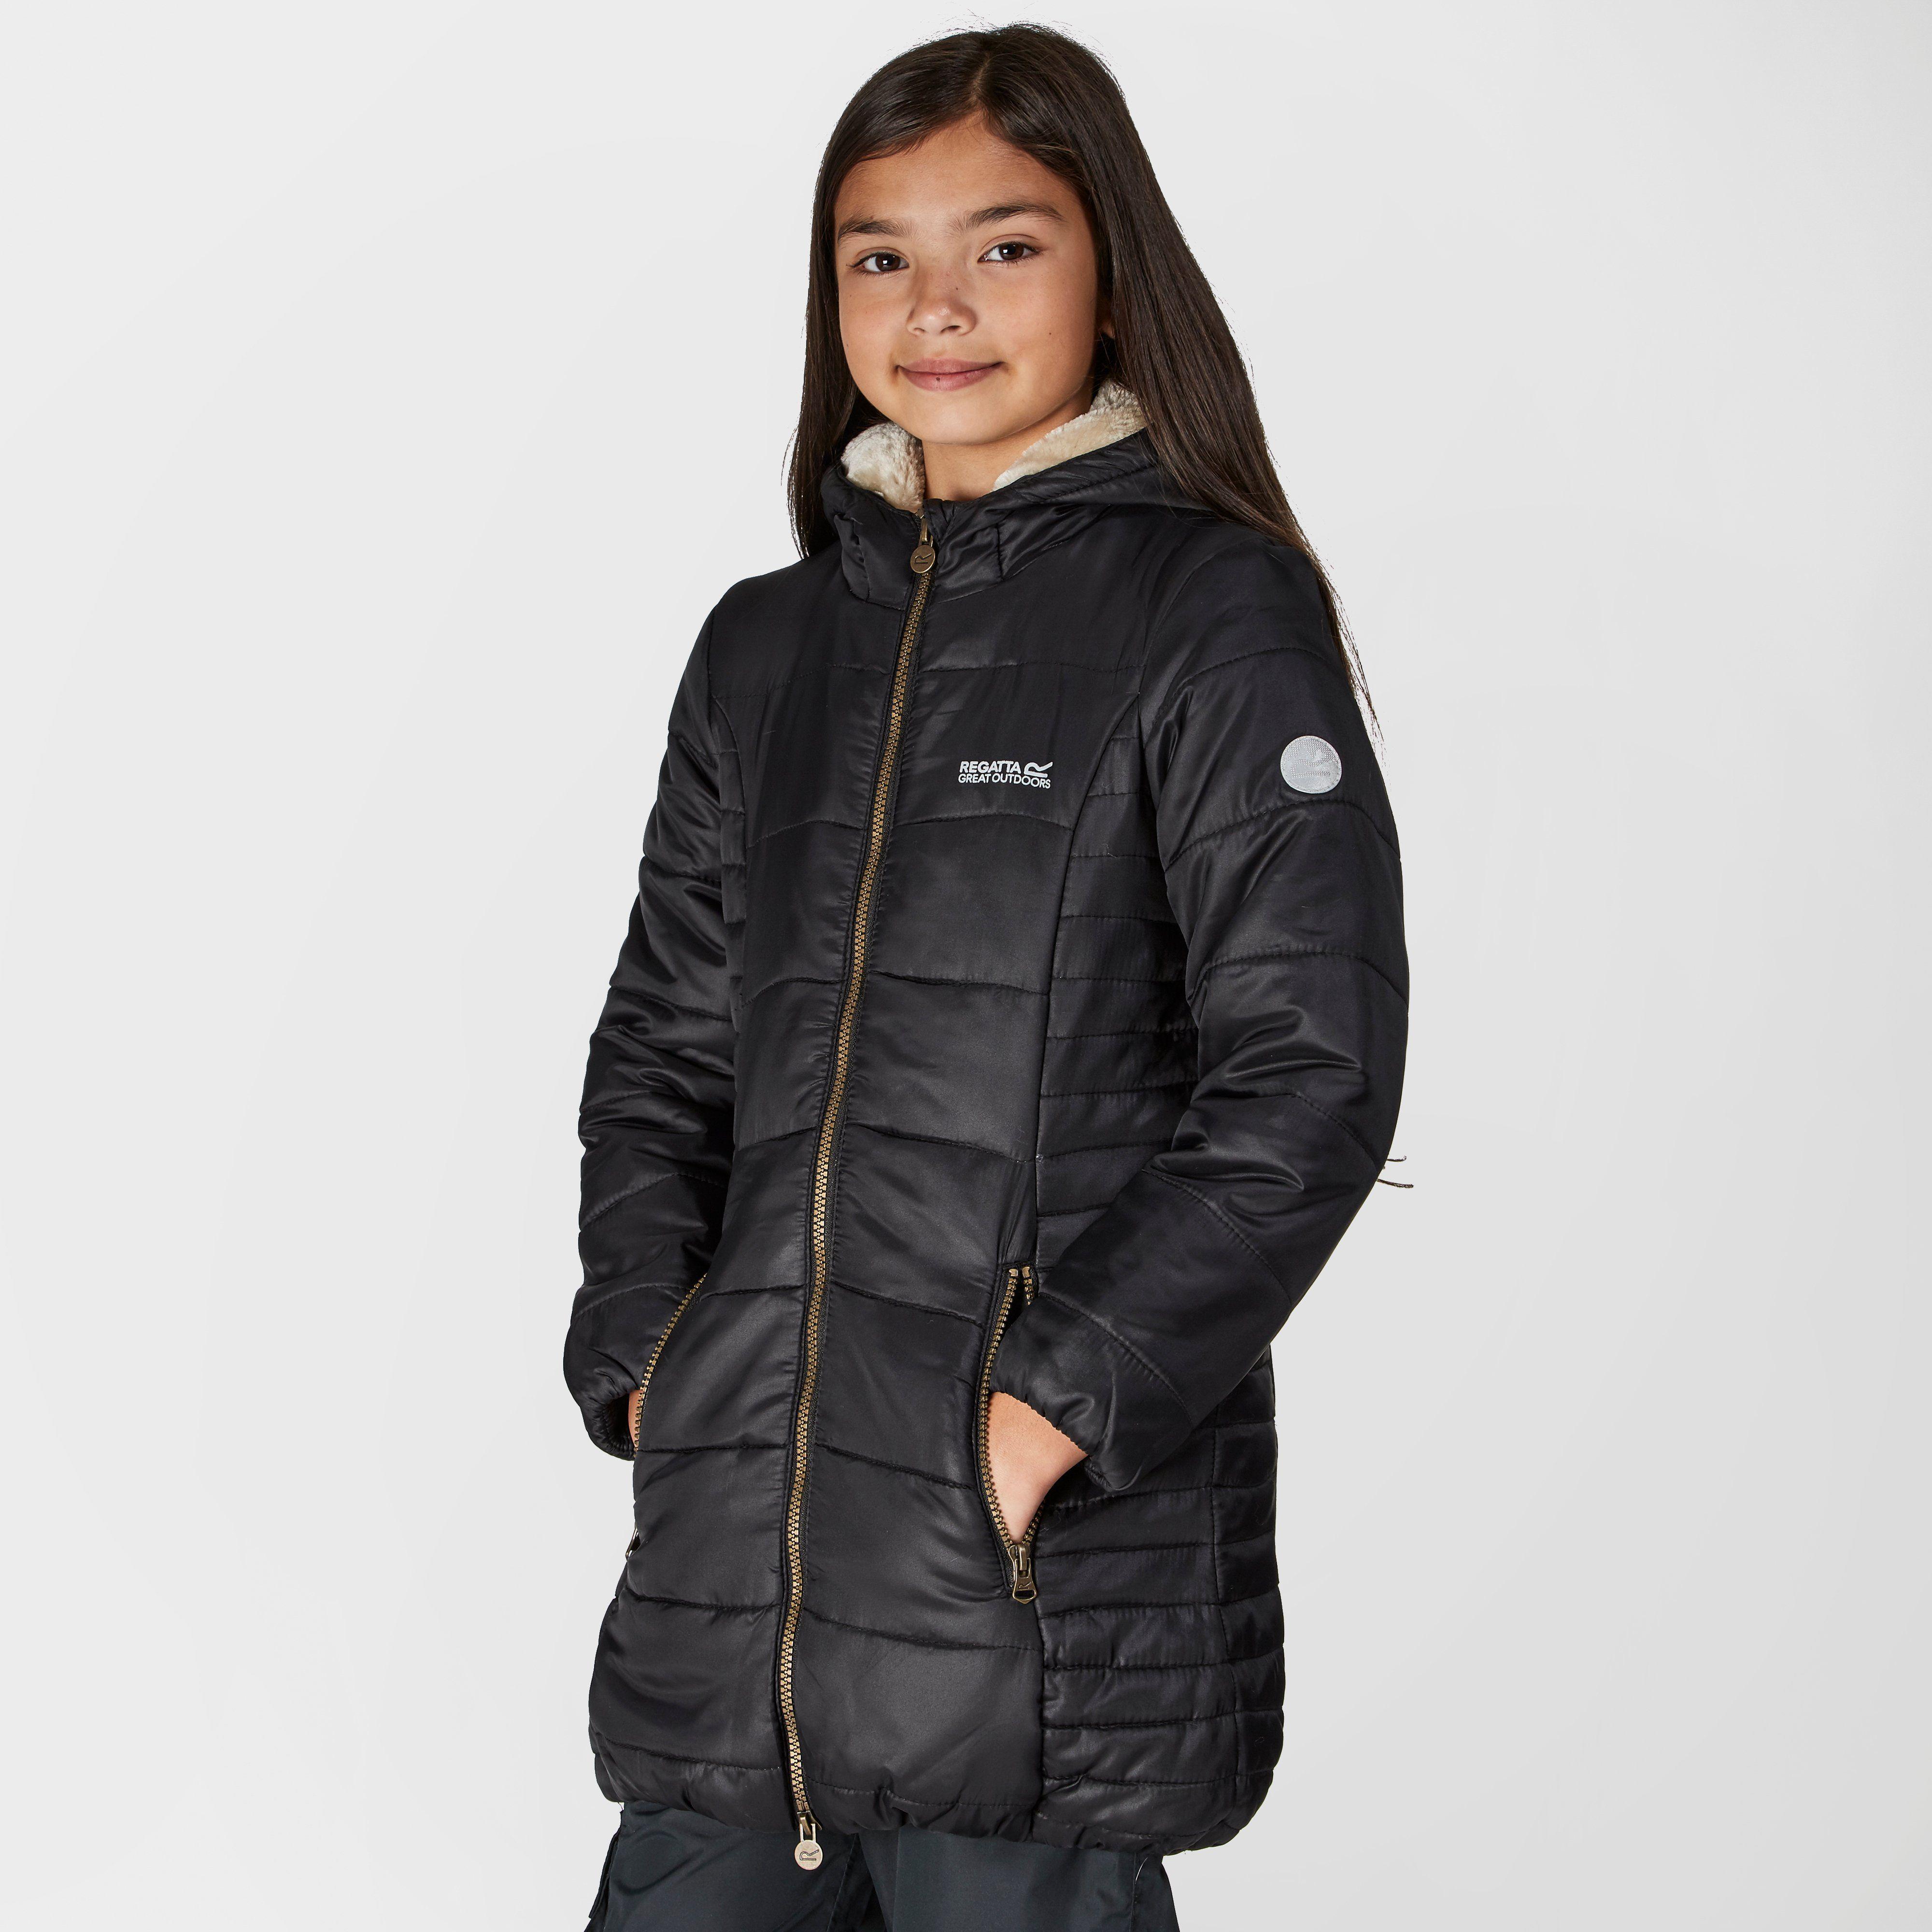 REGATTA Girl's Berryhill Insulated Jacket